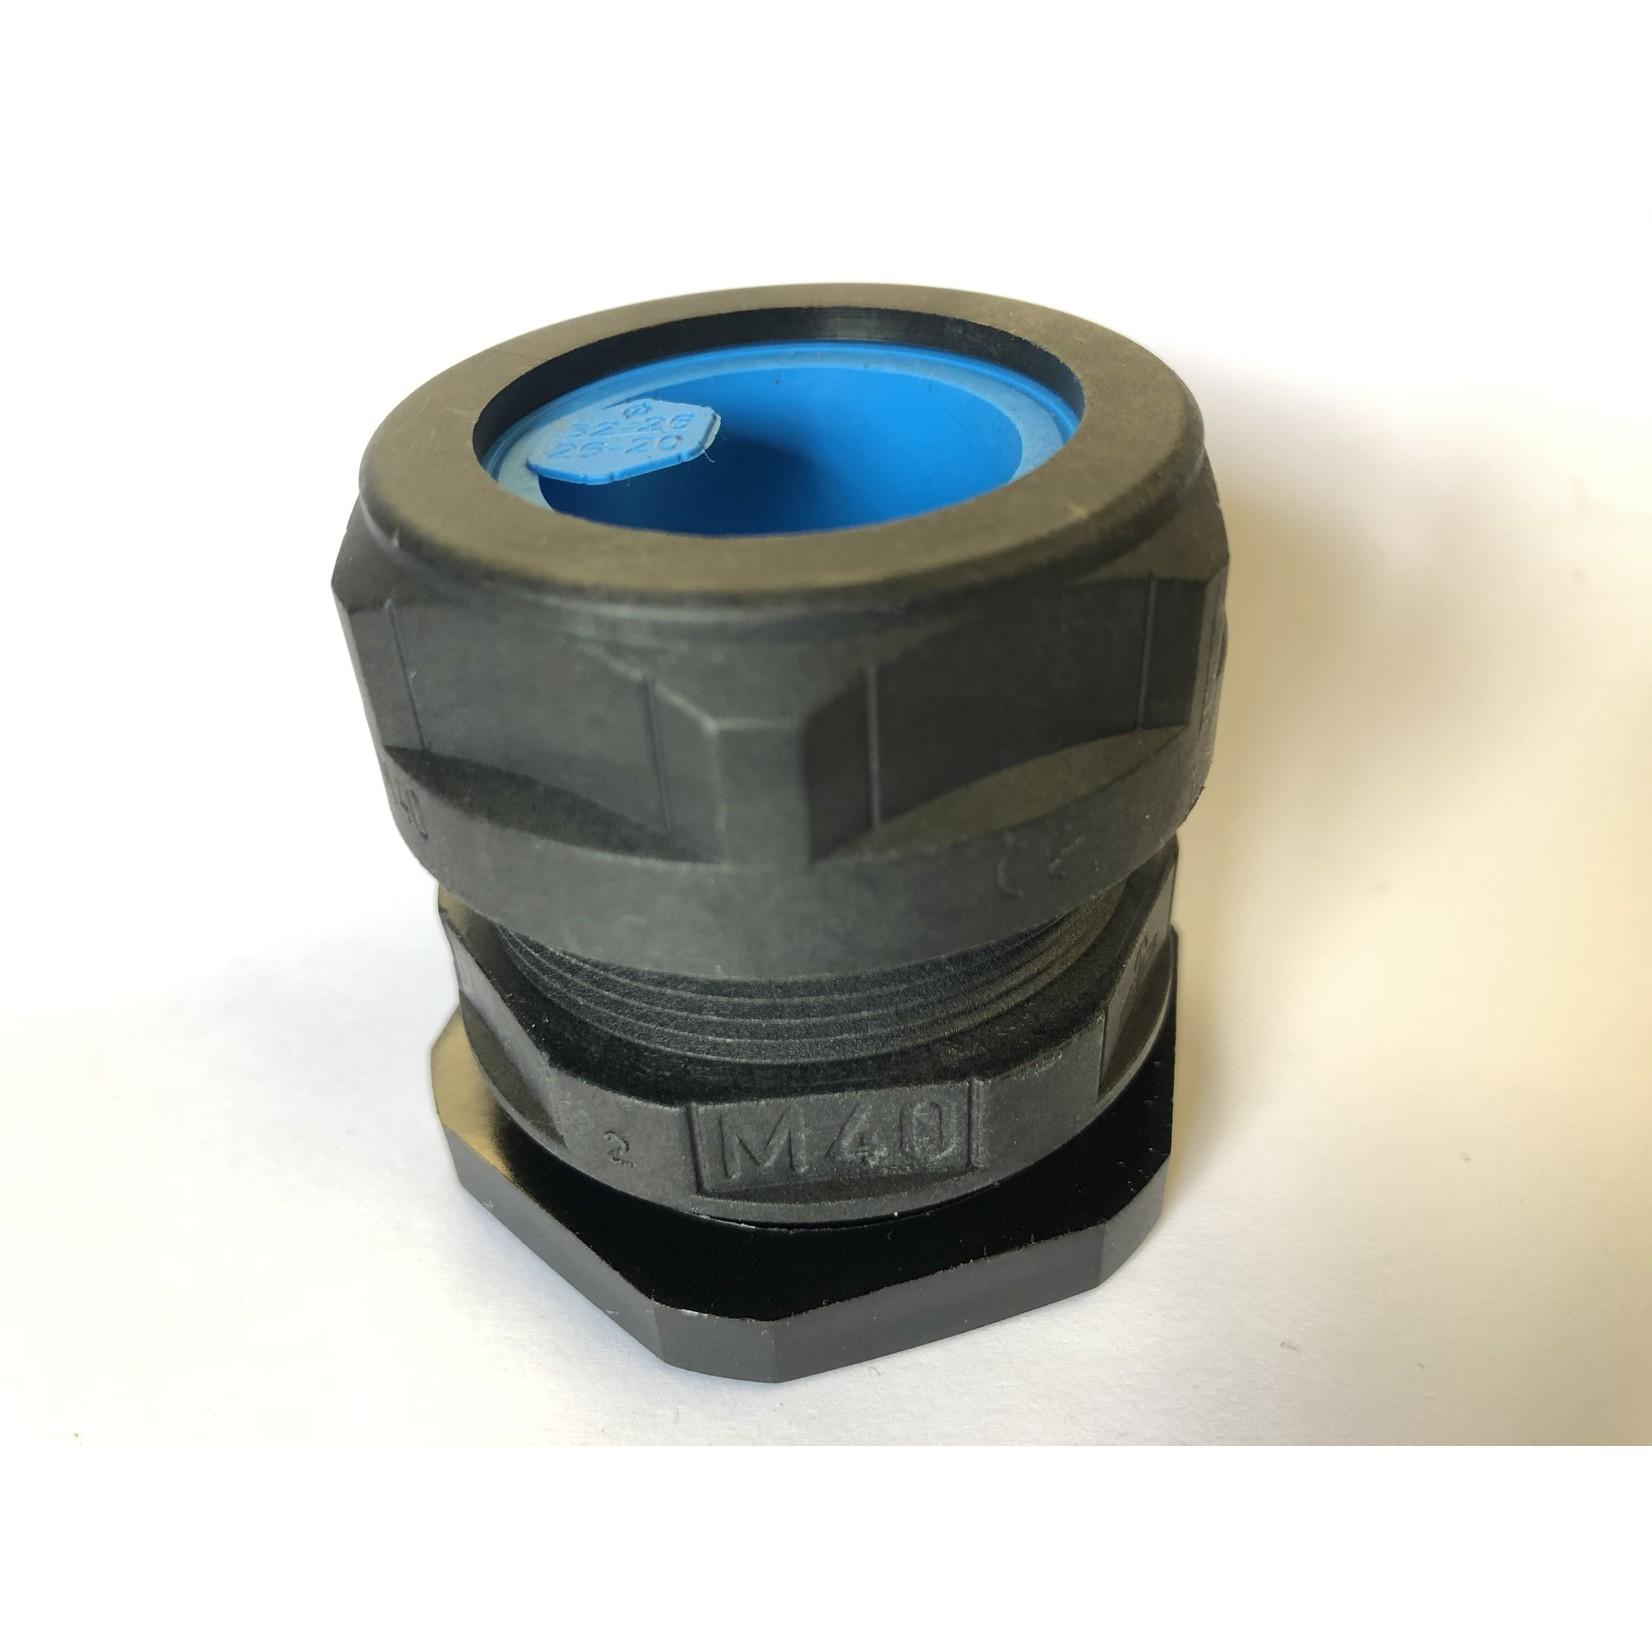 Robesol Sensor wartel M-40